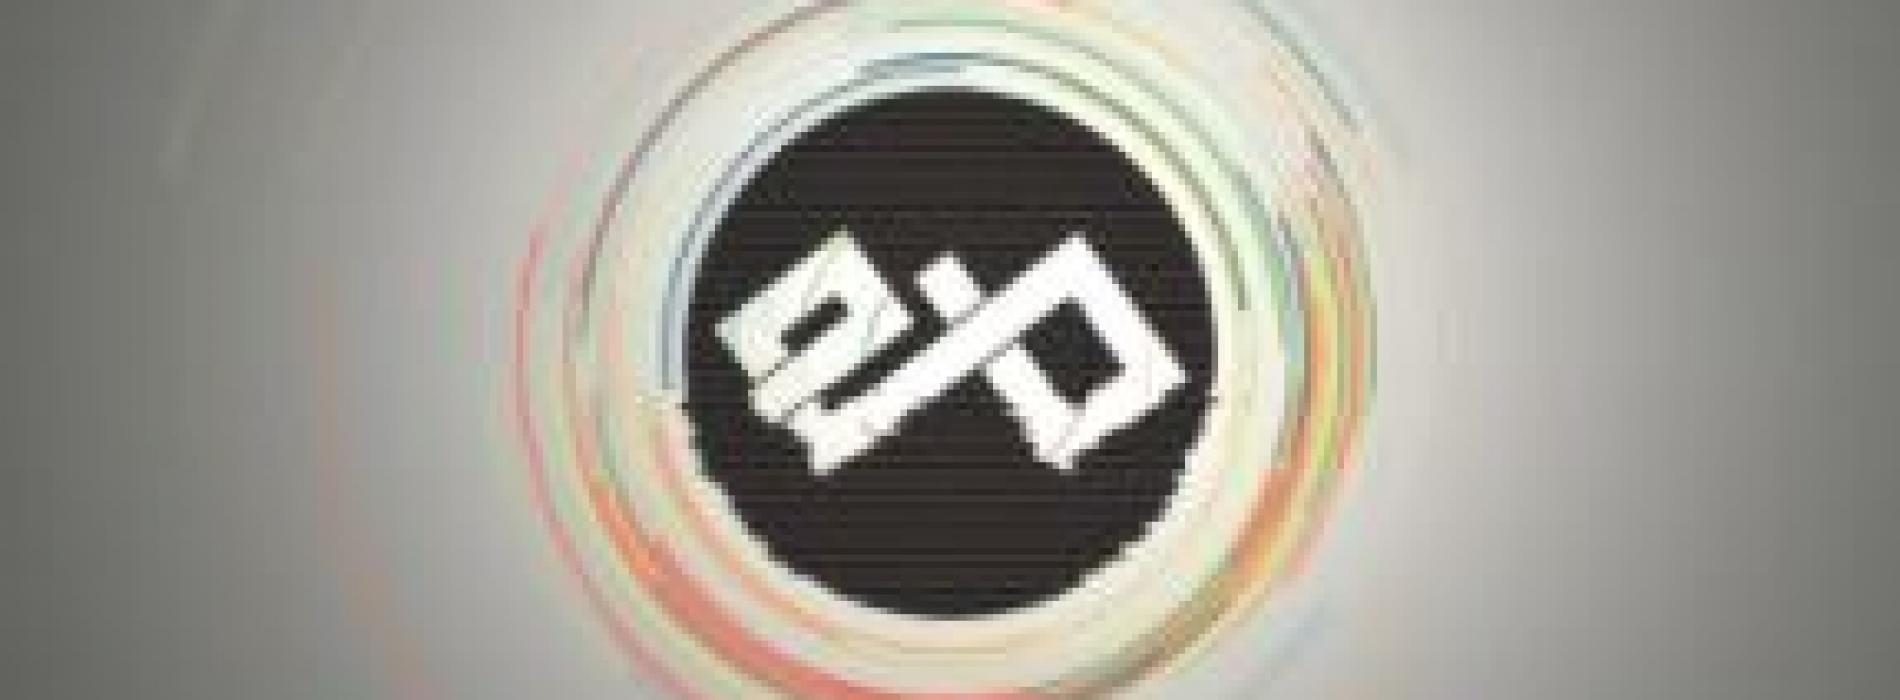 New Music : Sajay – Pareidolia